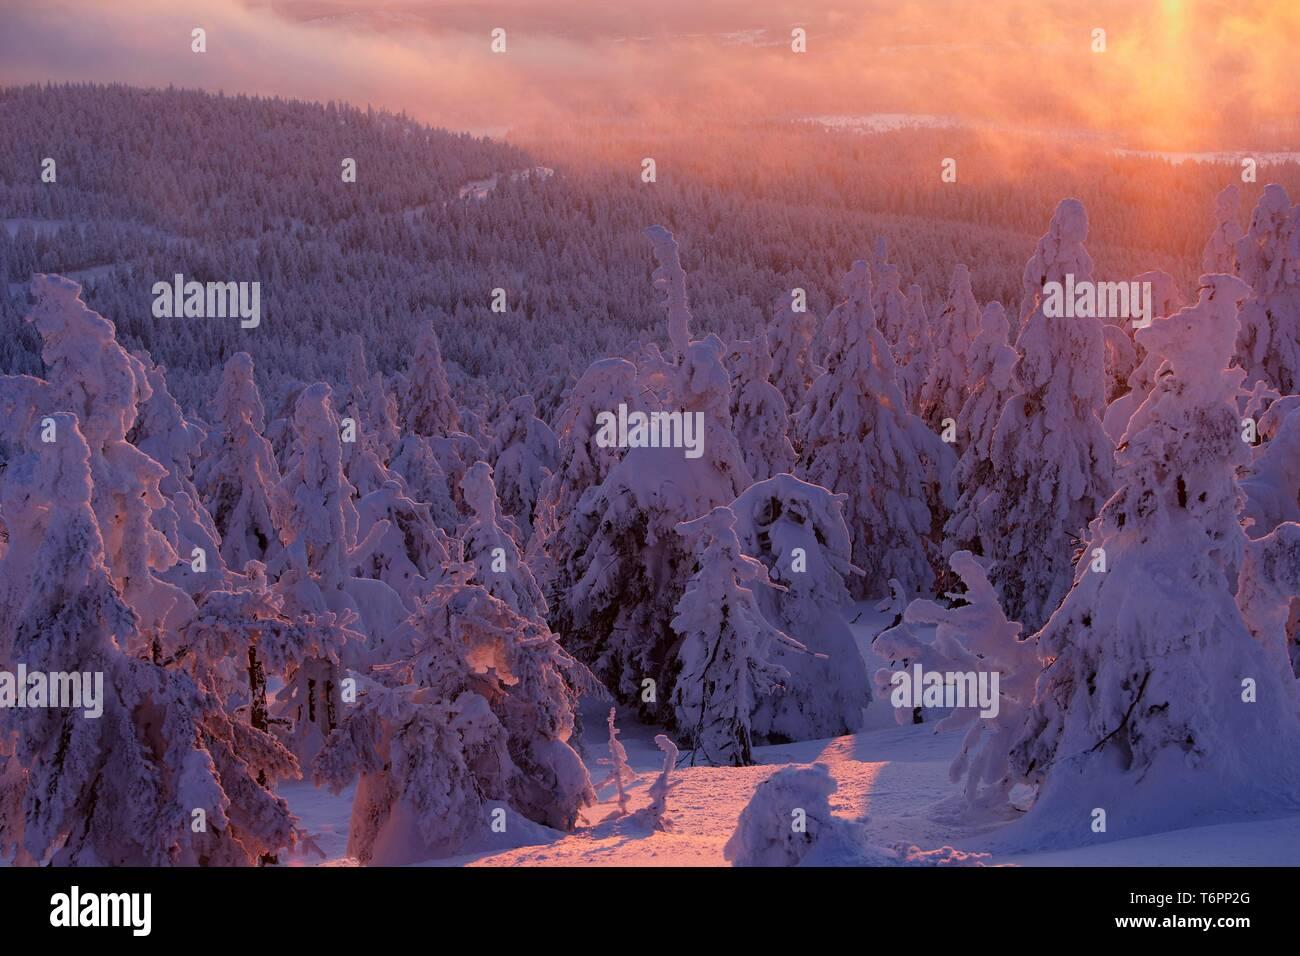 Mt. Brocken in winter at sunset, Harz mountains, Saxony-Anhalt, Germany, Europe Stock Photo